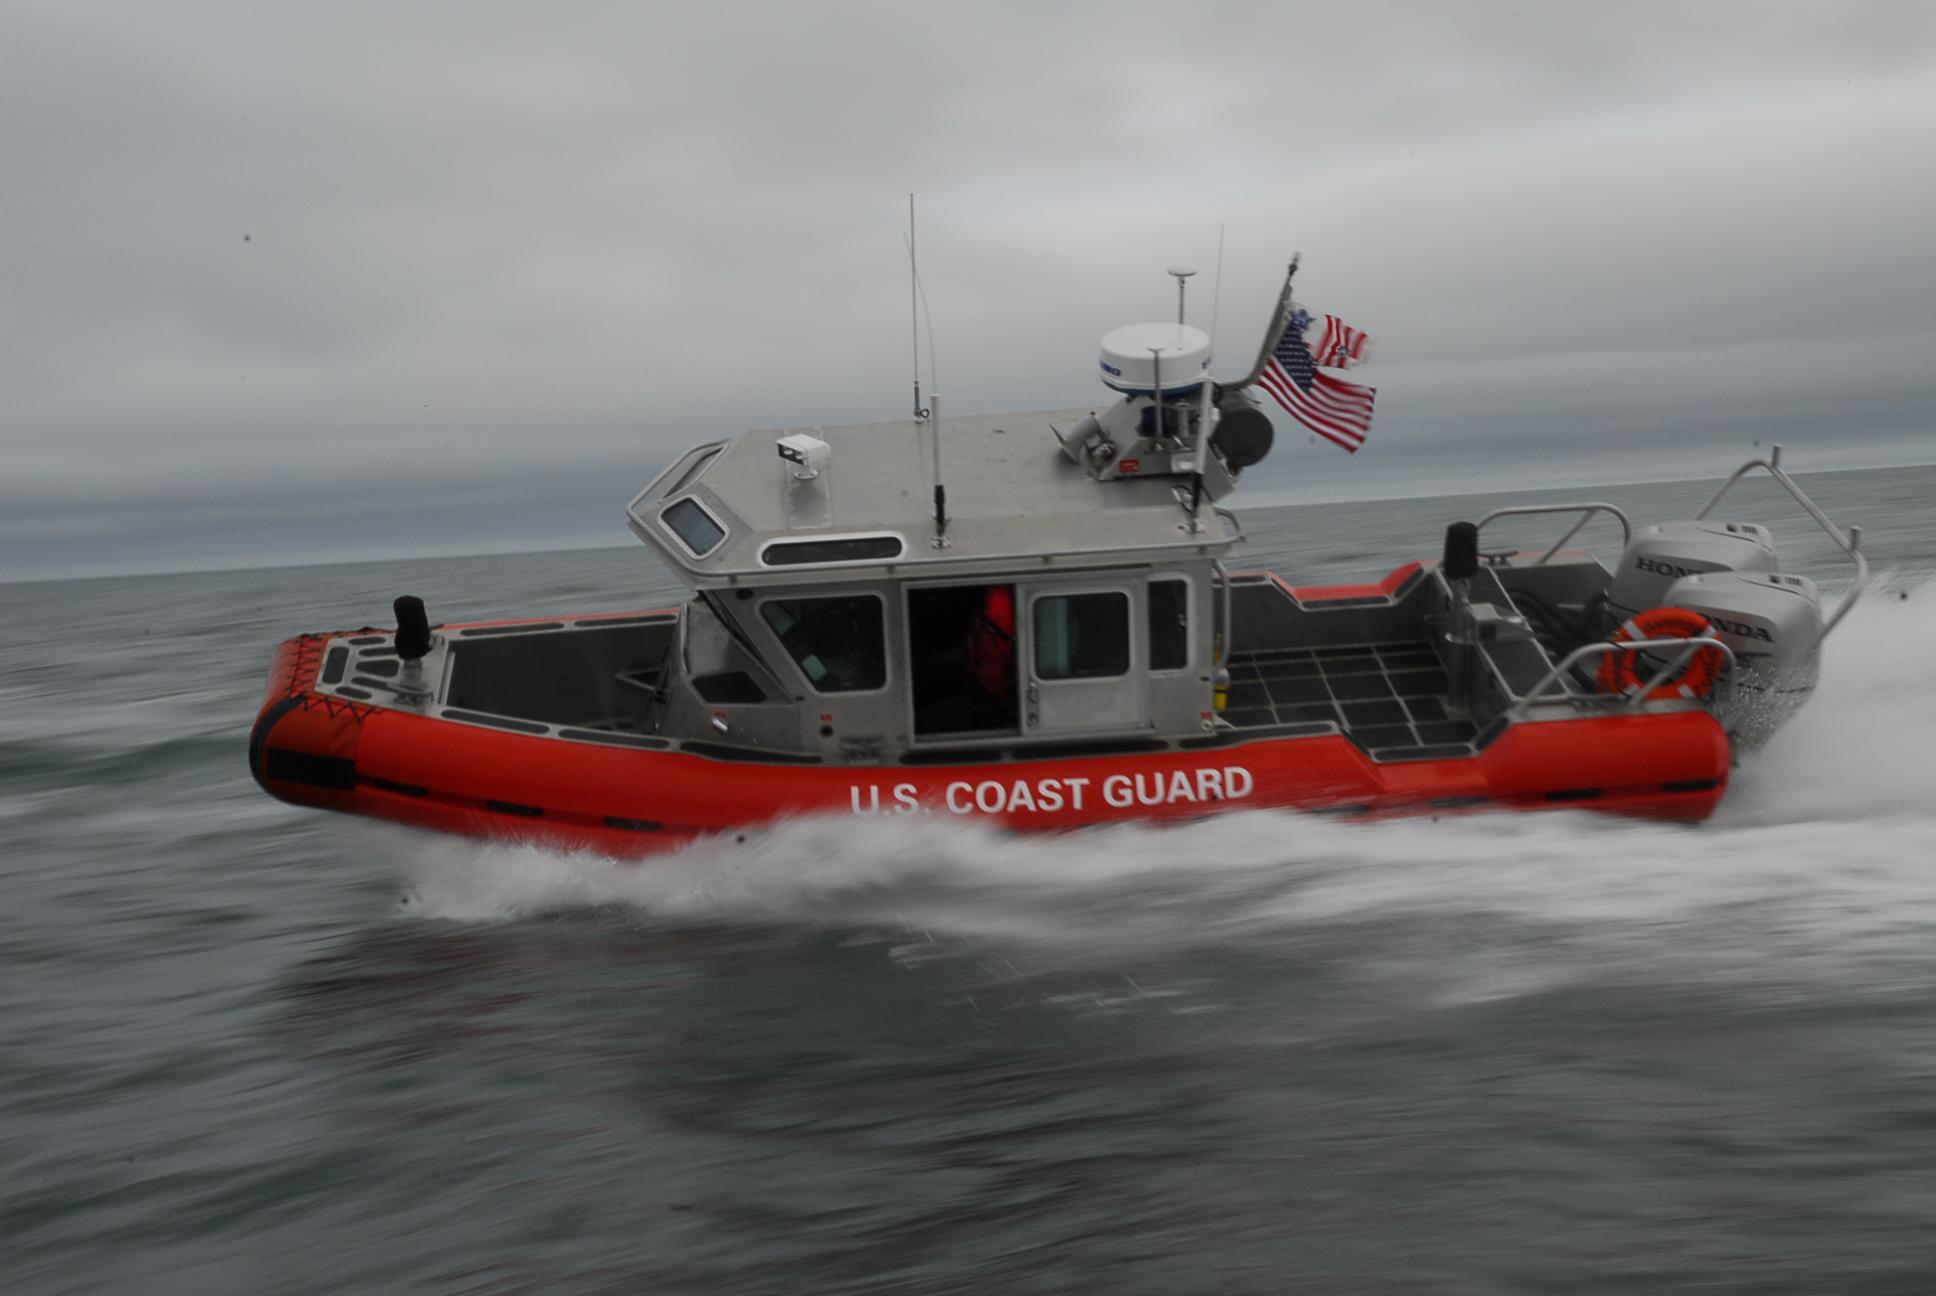 File:Defender class response boat (3883430100).jpg - Wikimedia Commons